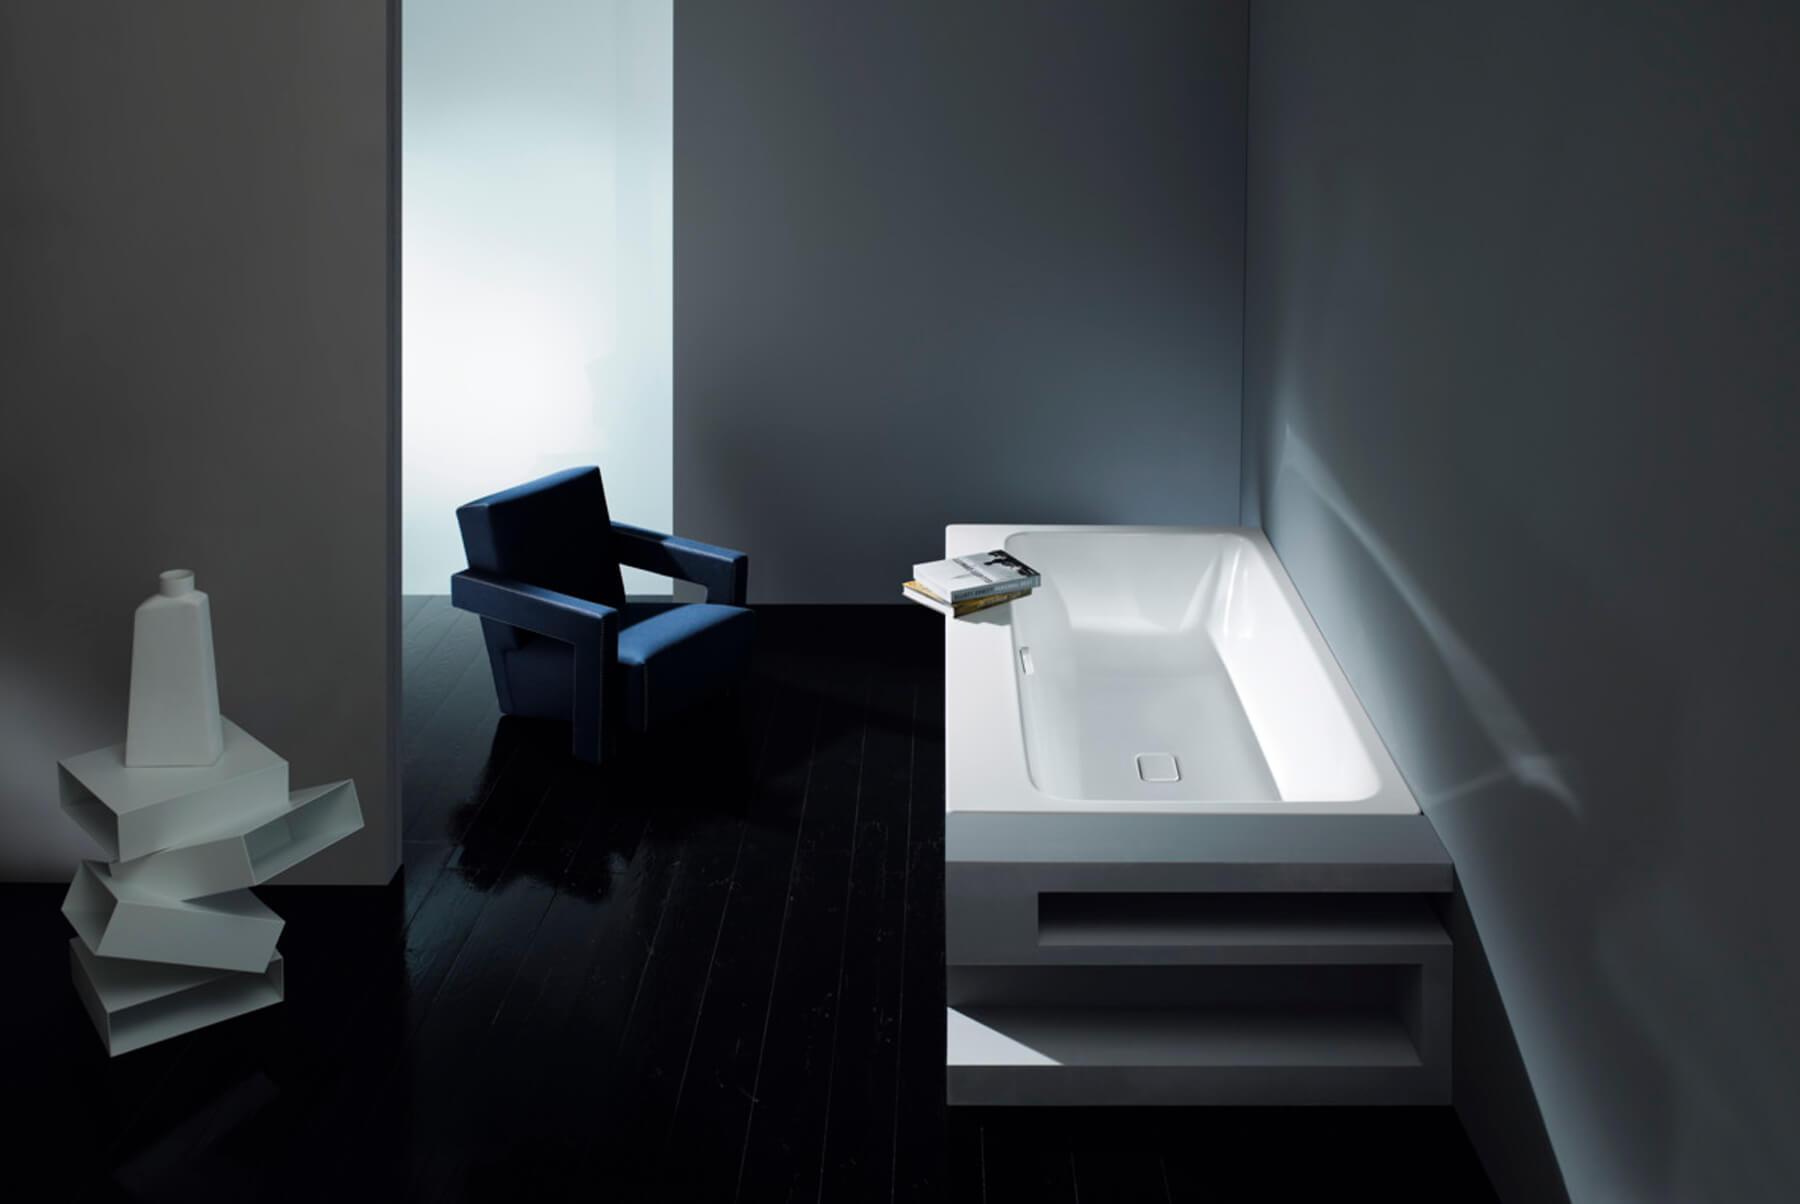 Bath-Tubs-Kaldewei-asymmetric-5-1800x1204